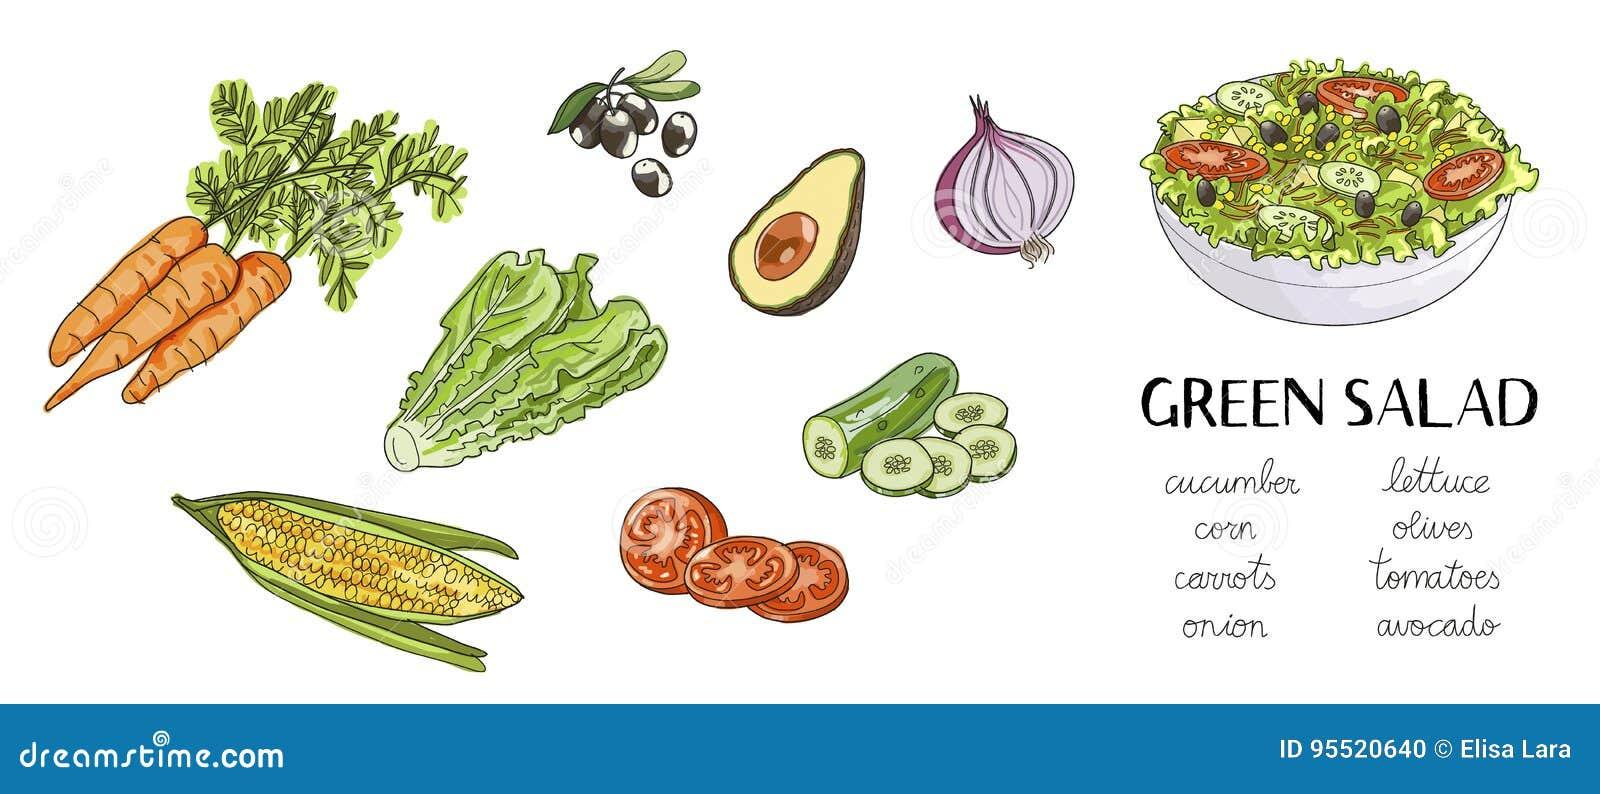 Illustration of hand drawn green salad ingredients: